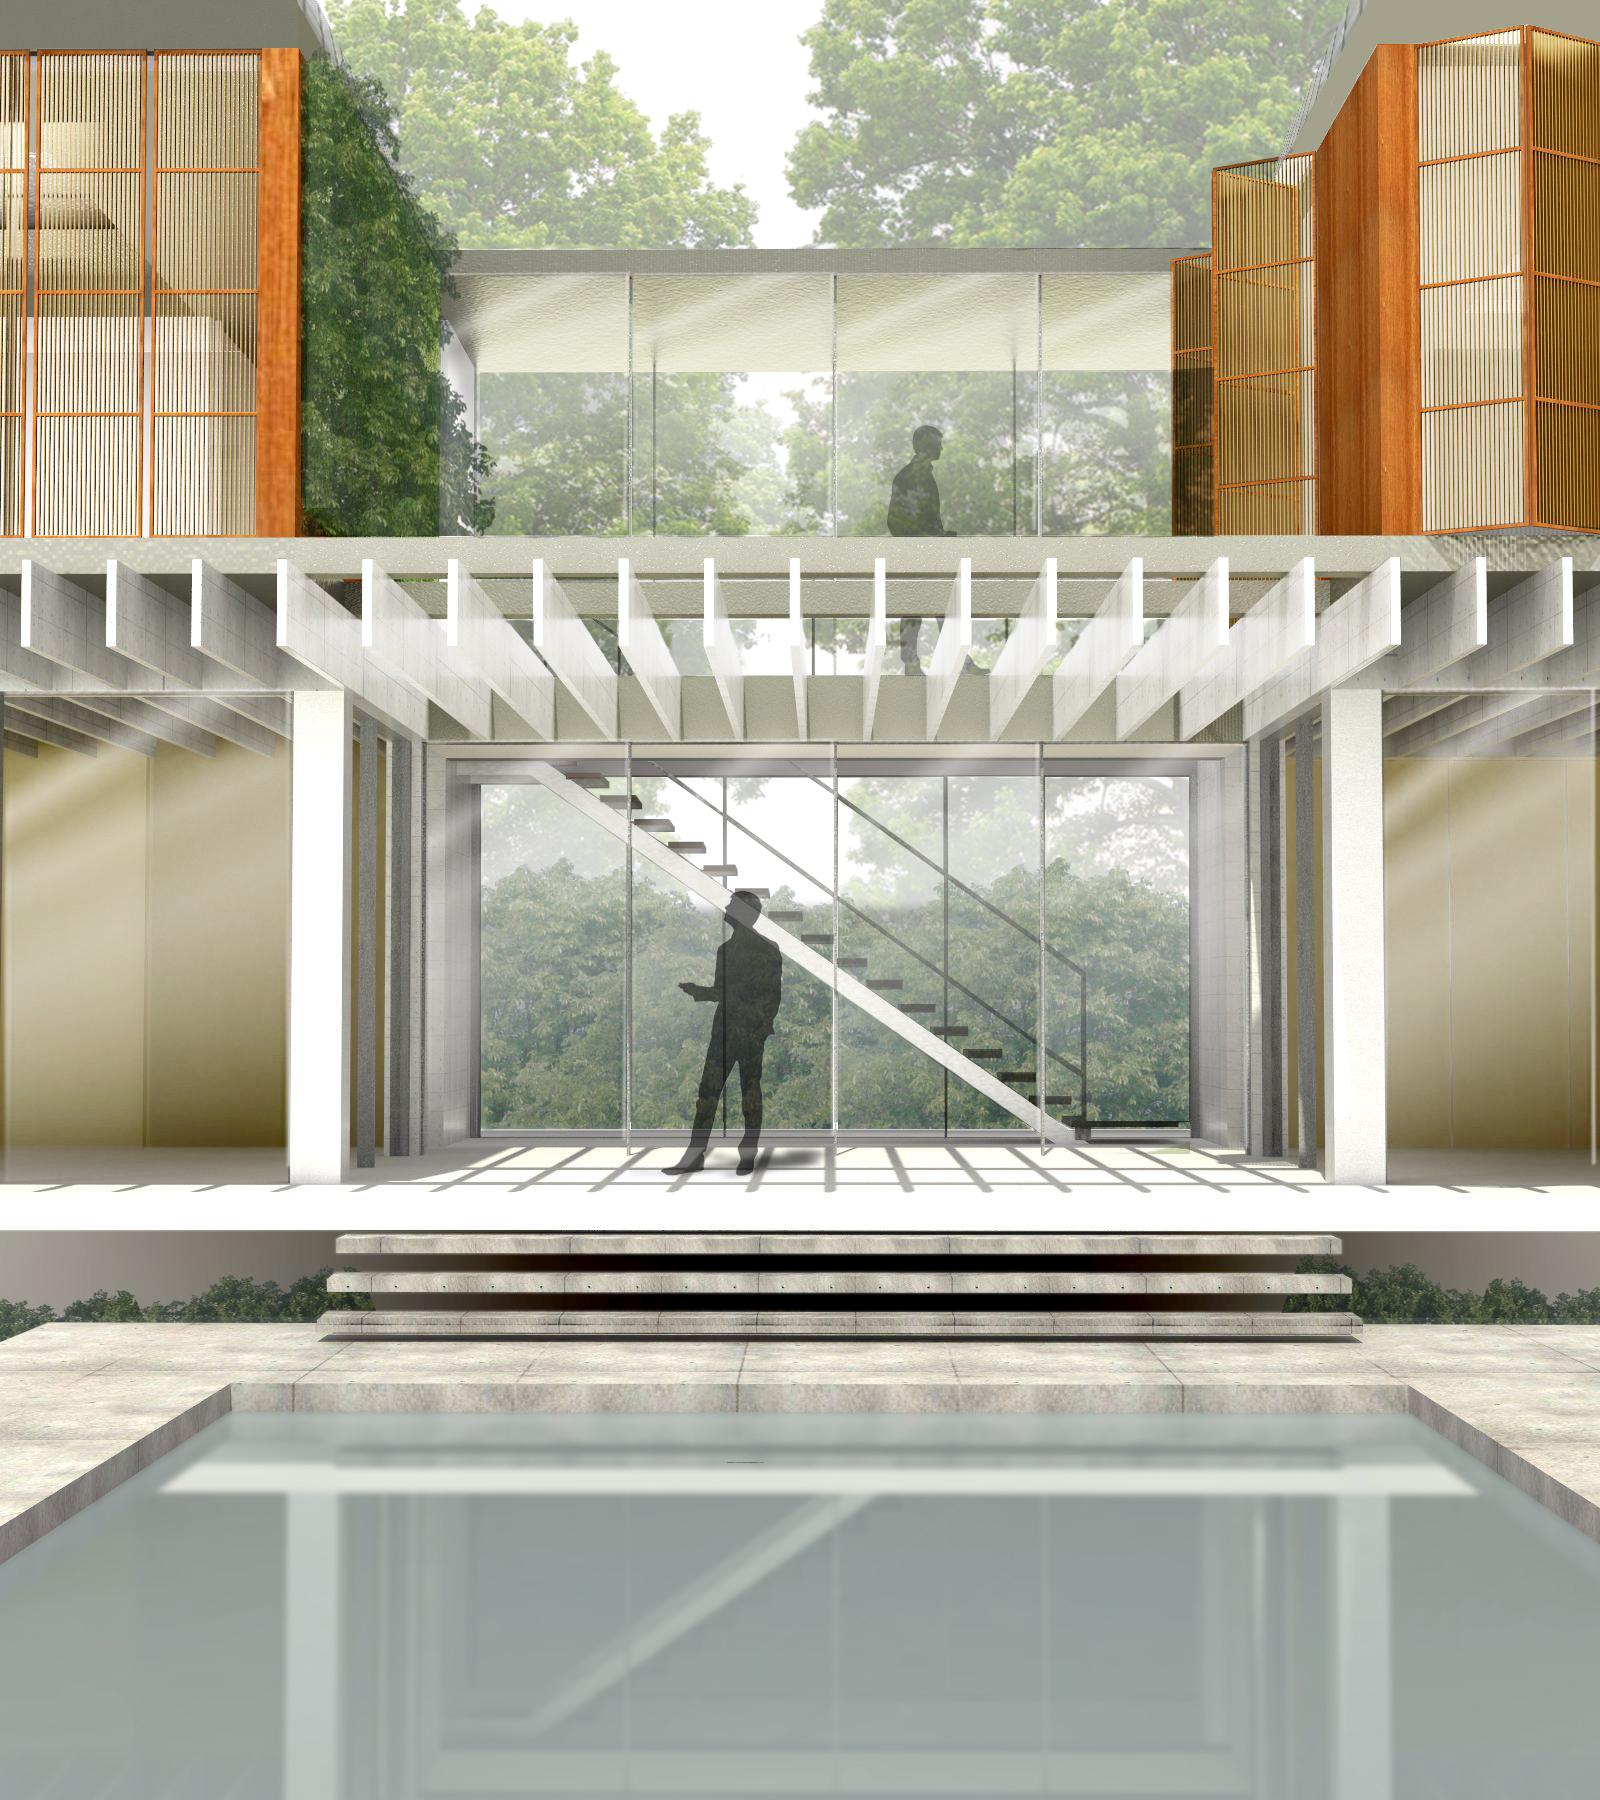 luis-pons-design-interior-miami-residential-tropical-modern_2.jpg